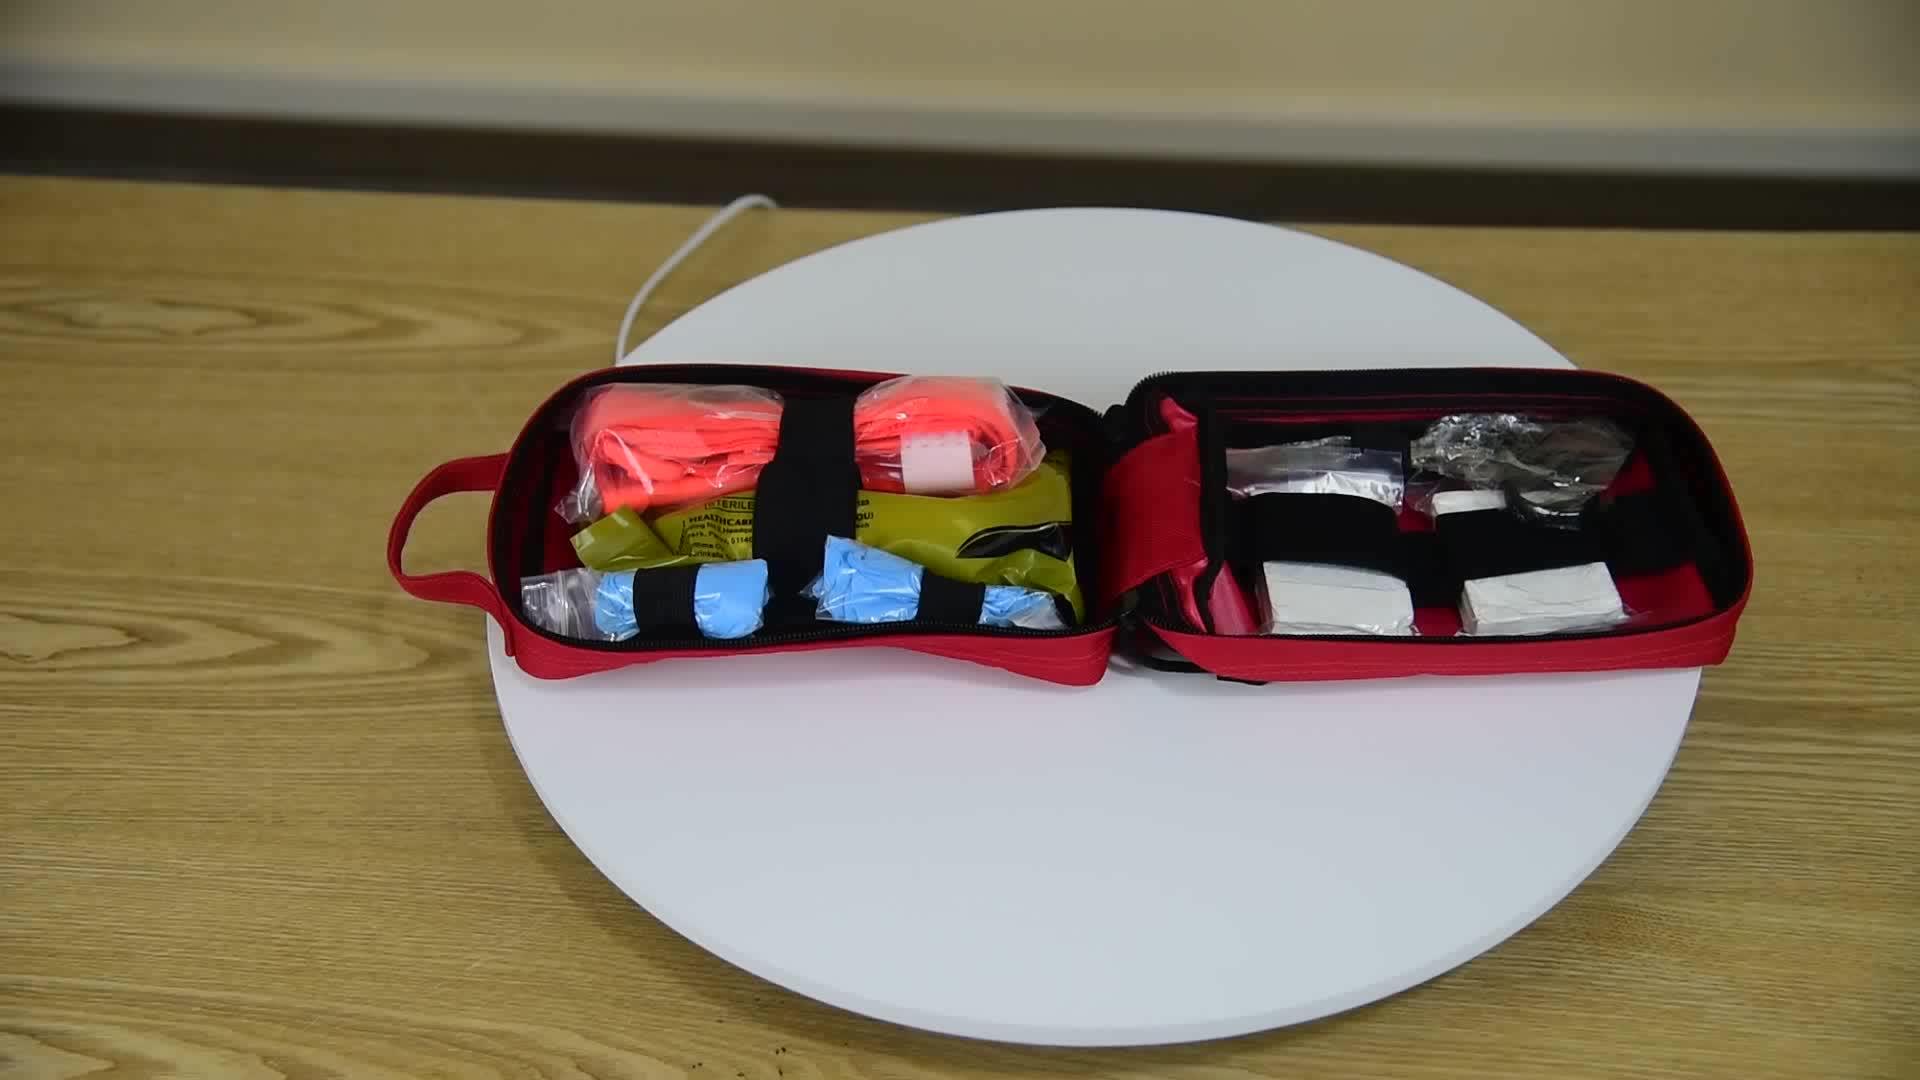 WAP - สุขภาพการแพทย์ First Aid อุปกรณ์ Fast หยุดเลือดเลือดออกชุดควบคุม